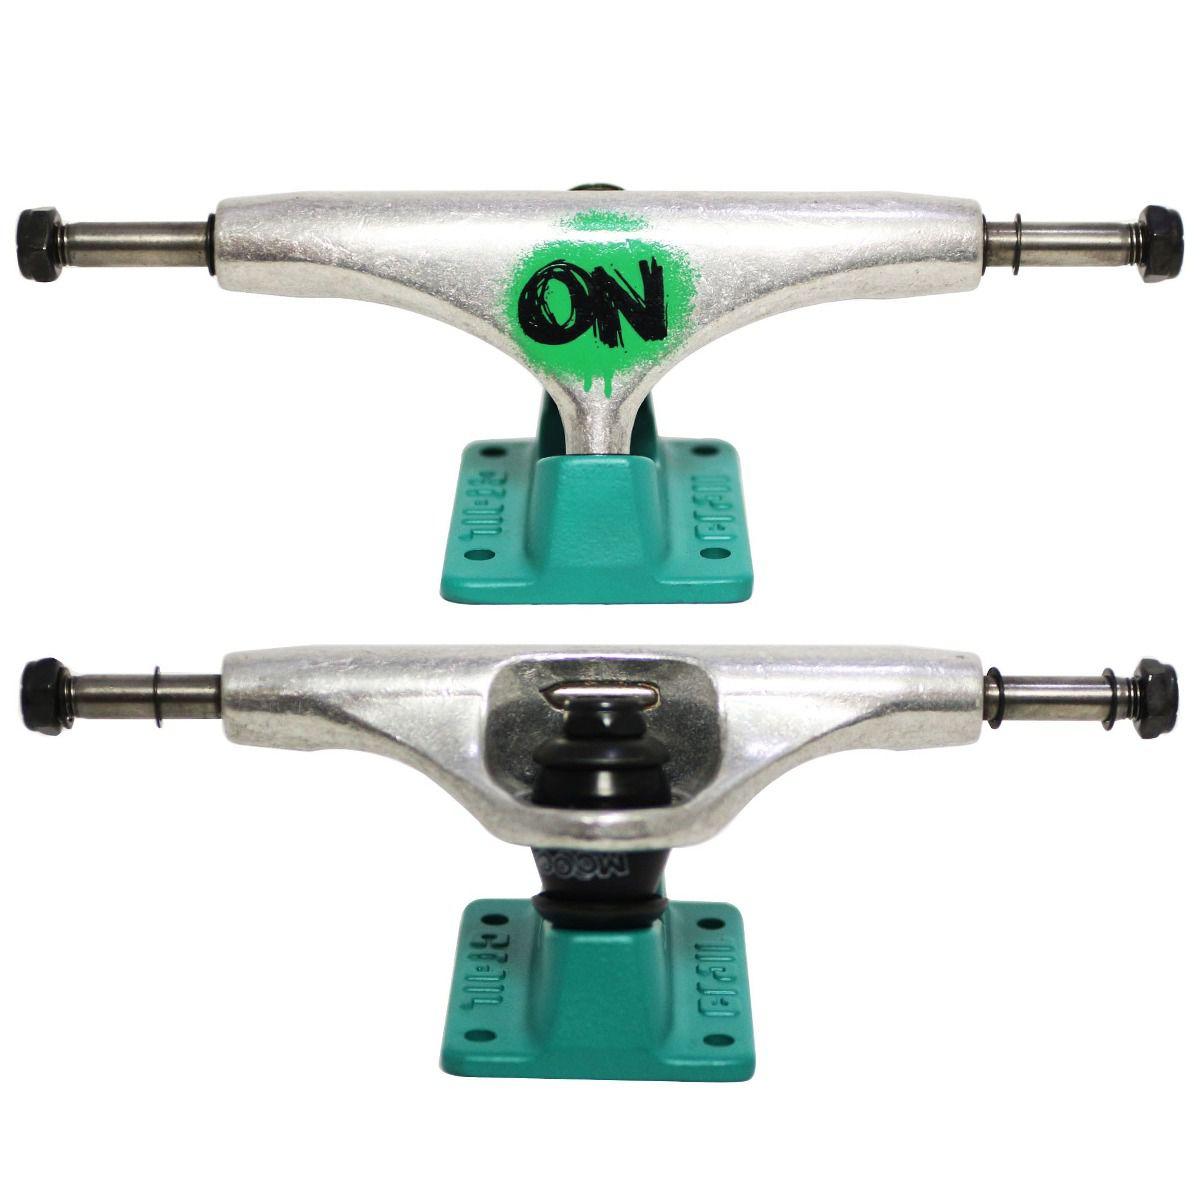 Skate Element Montado Completo Pro Rhom Crail Moska